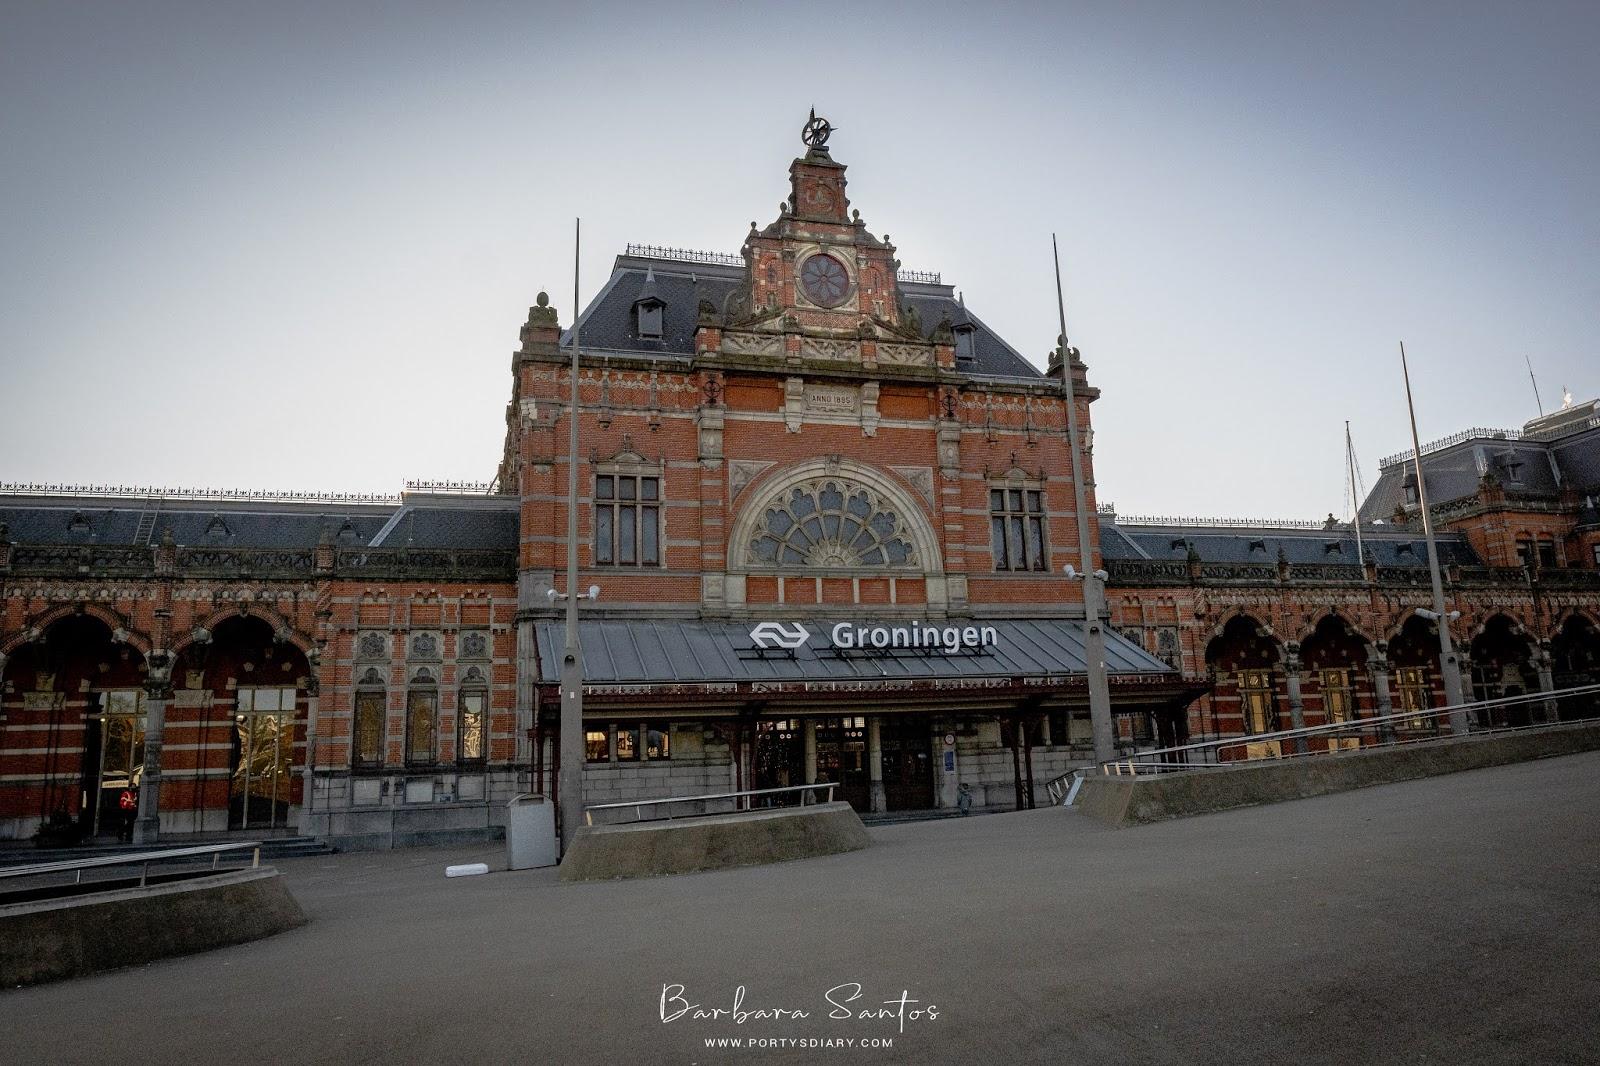 Train Station in Groningen.